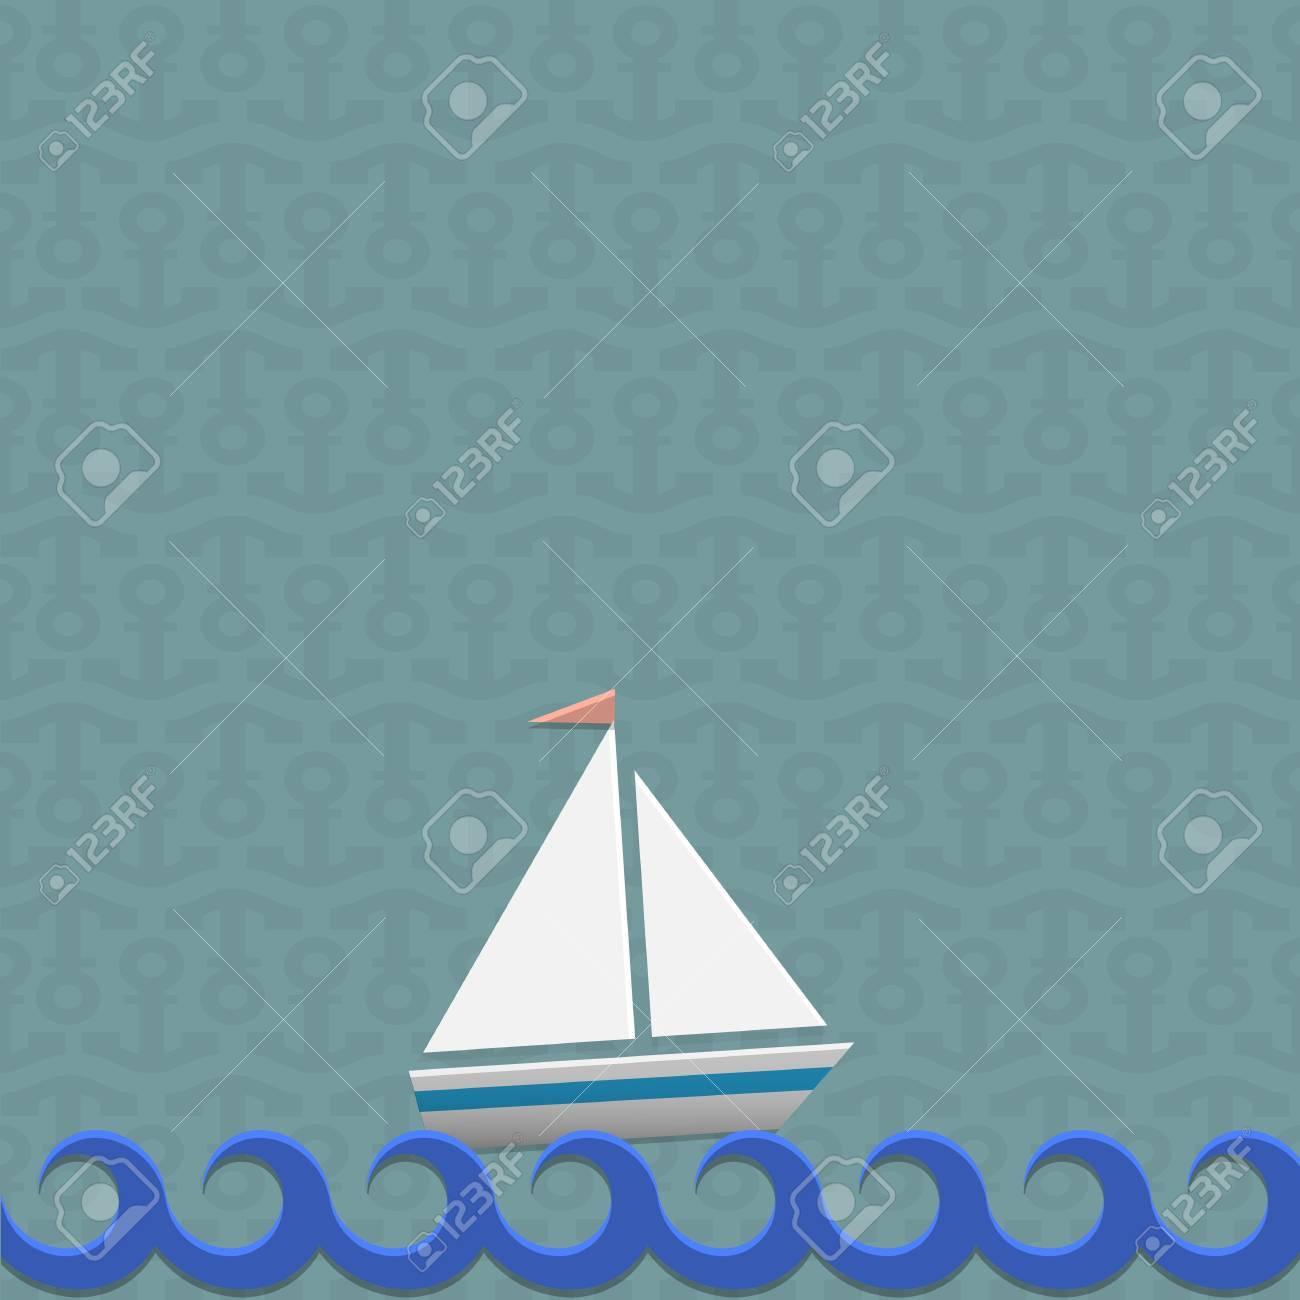 Sailing boat illustration Stock Vector - 19869811